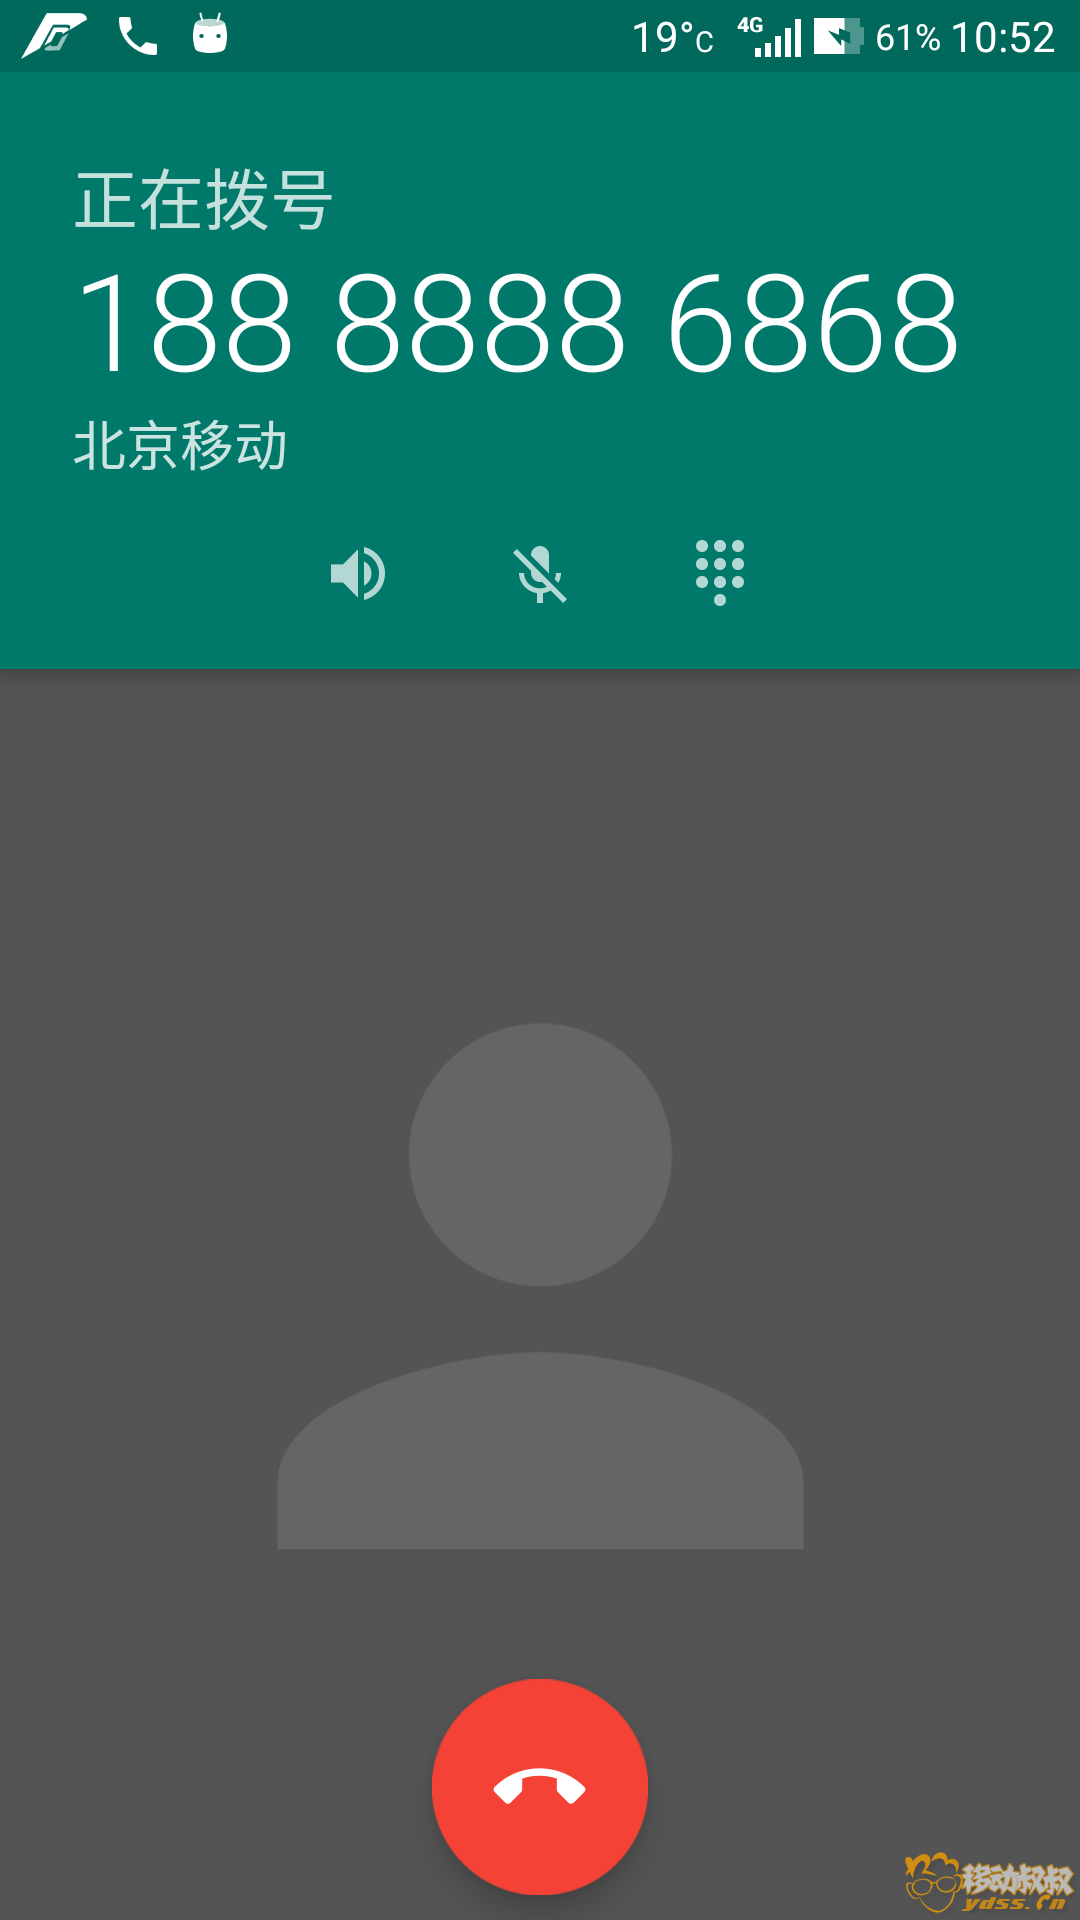 Screenshot_20161119-225242.png